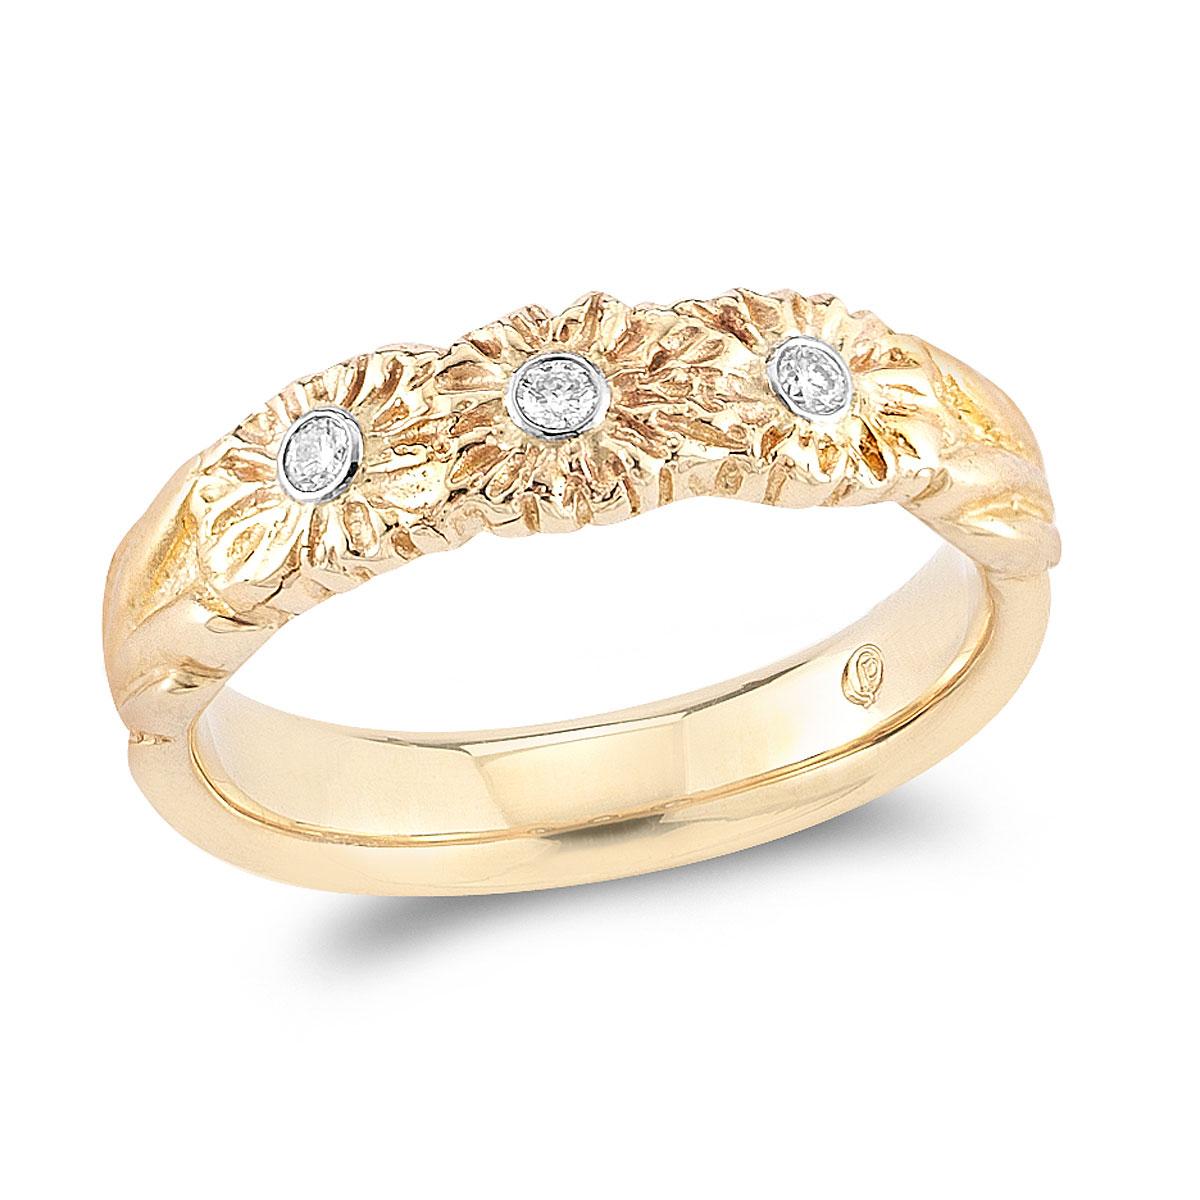 WR0247 Daisy Ring